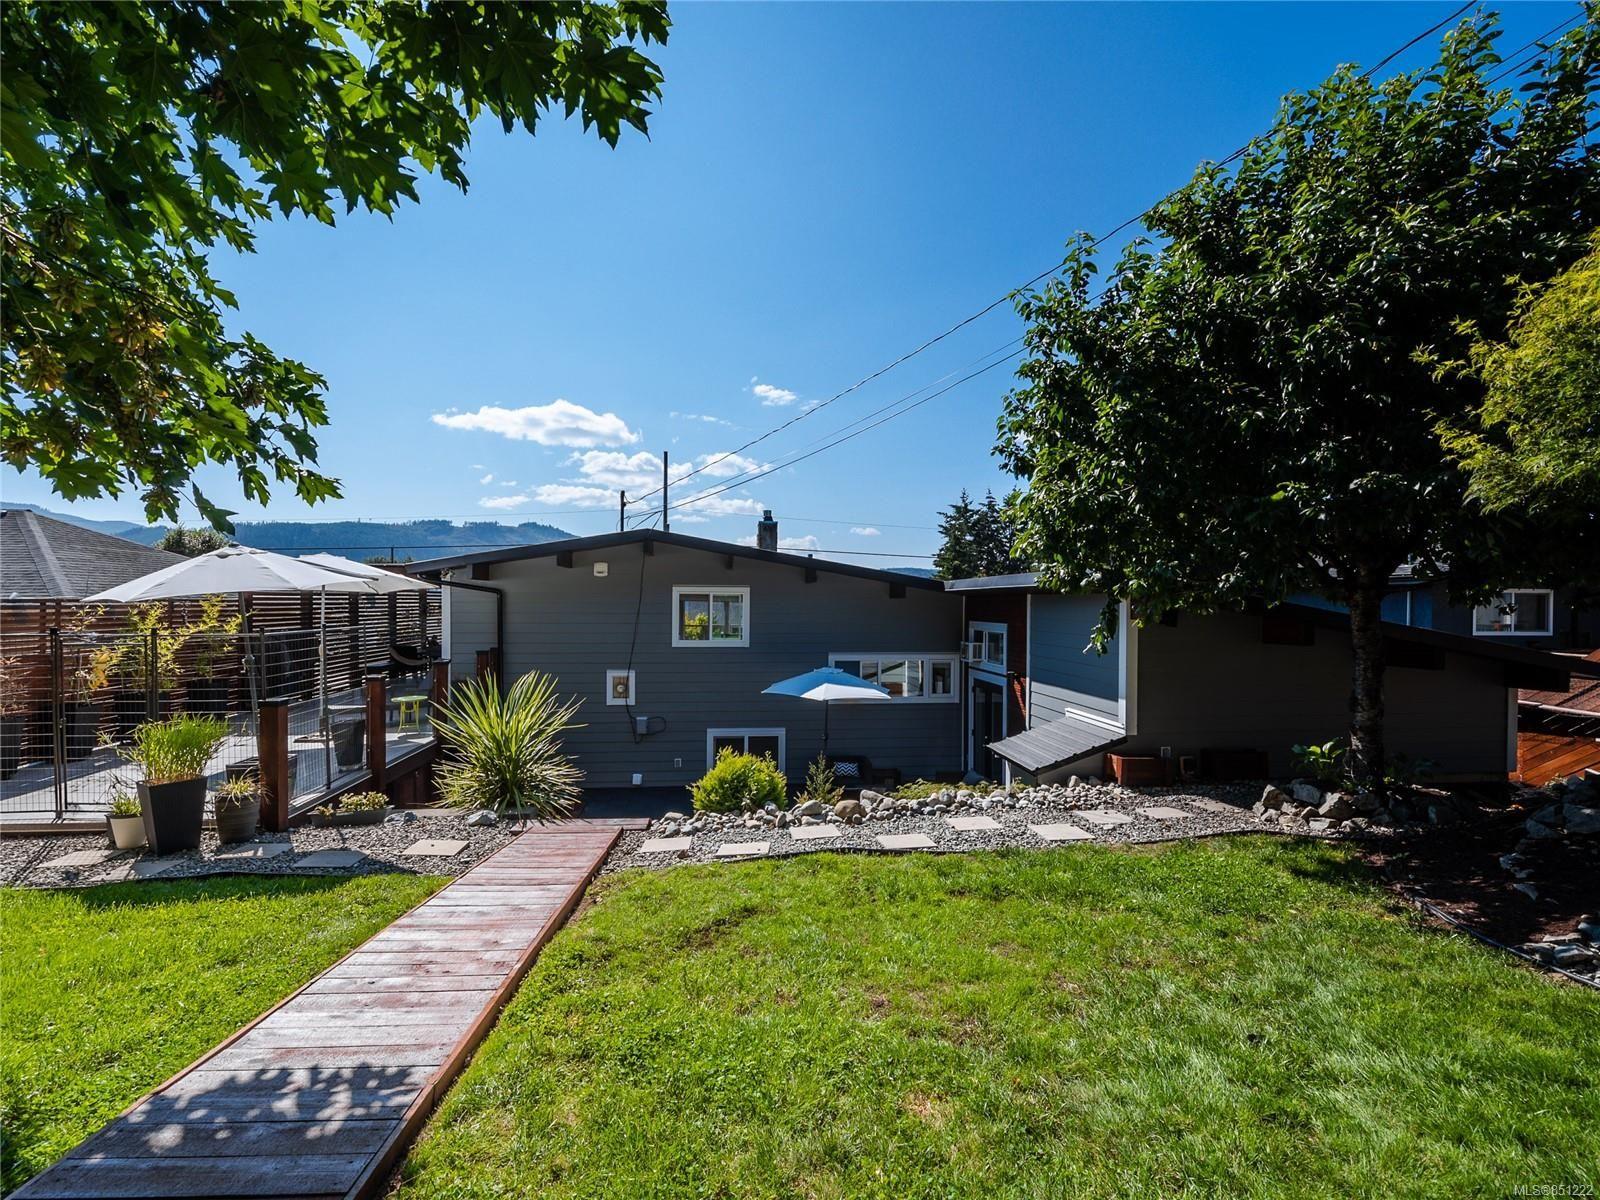 Photo 36: Photos: 2525 11th Ave in : PA Port Alberni House for sale (Port Alberni)  : MLS®# 851222